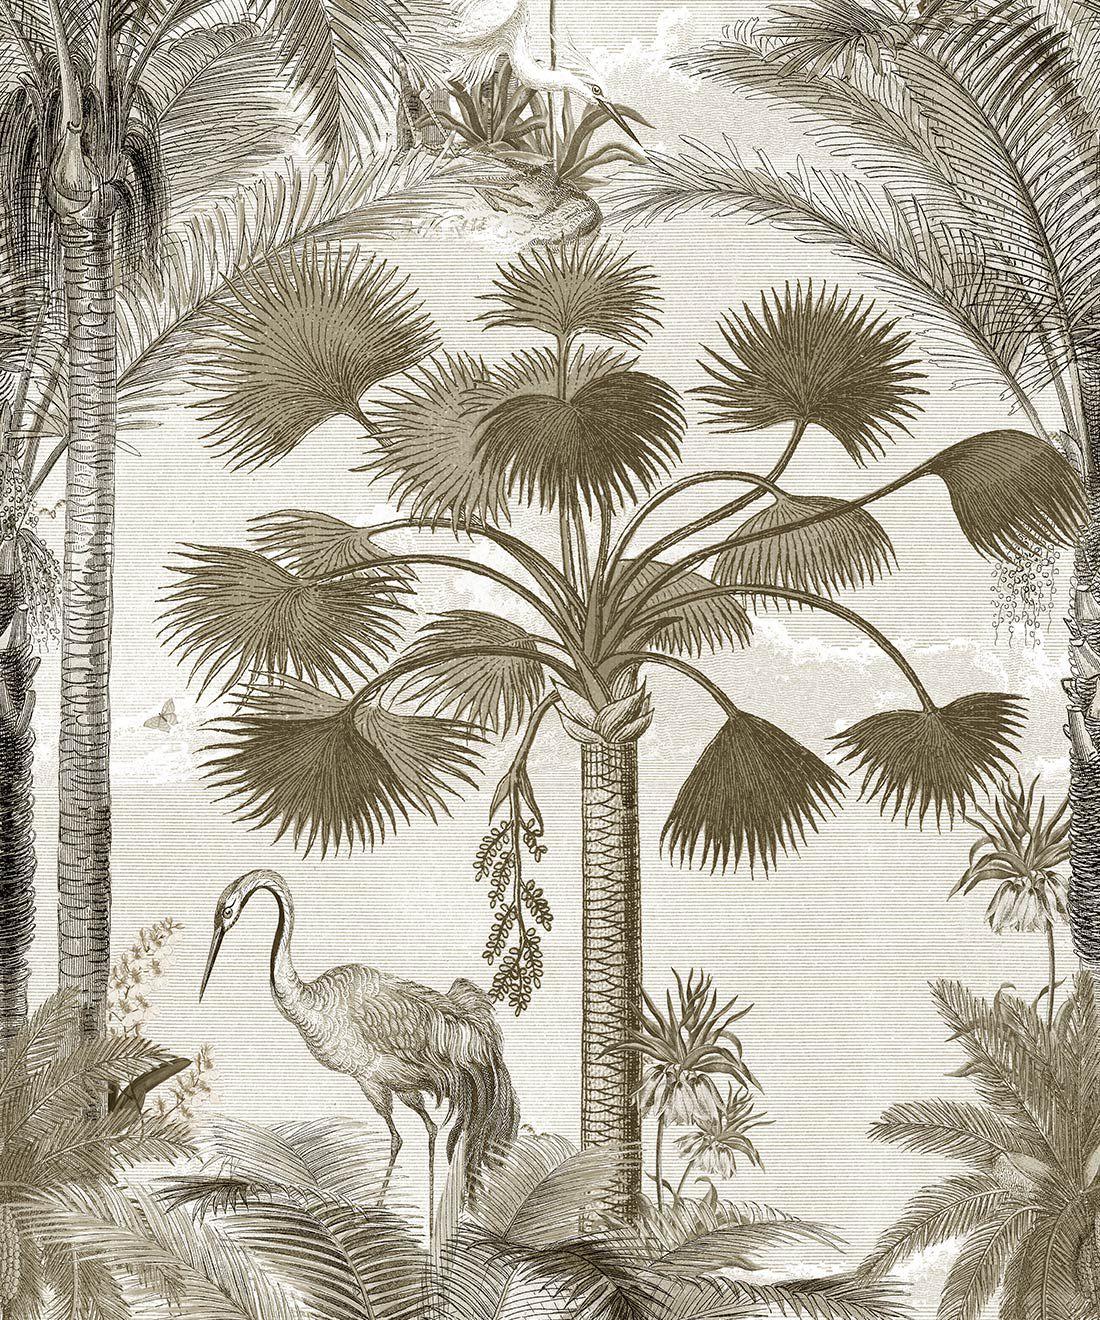 Kerala Palms Wallpaper Mural •Bethany Linz • Palm Tree Mural • Sepia • Swatch